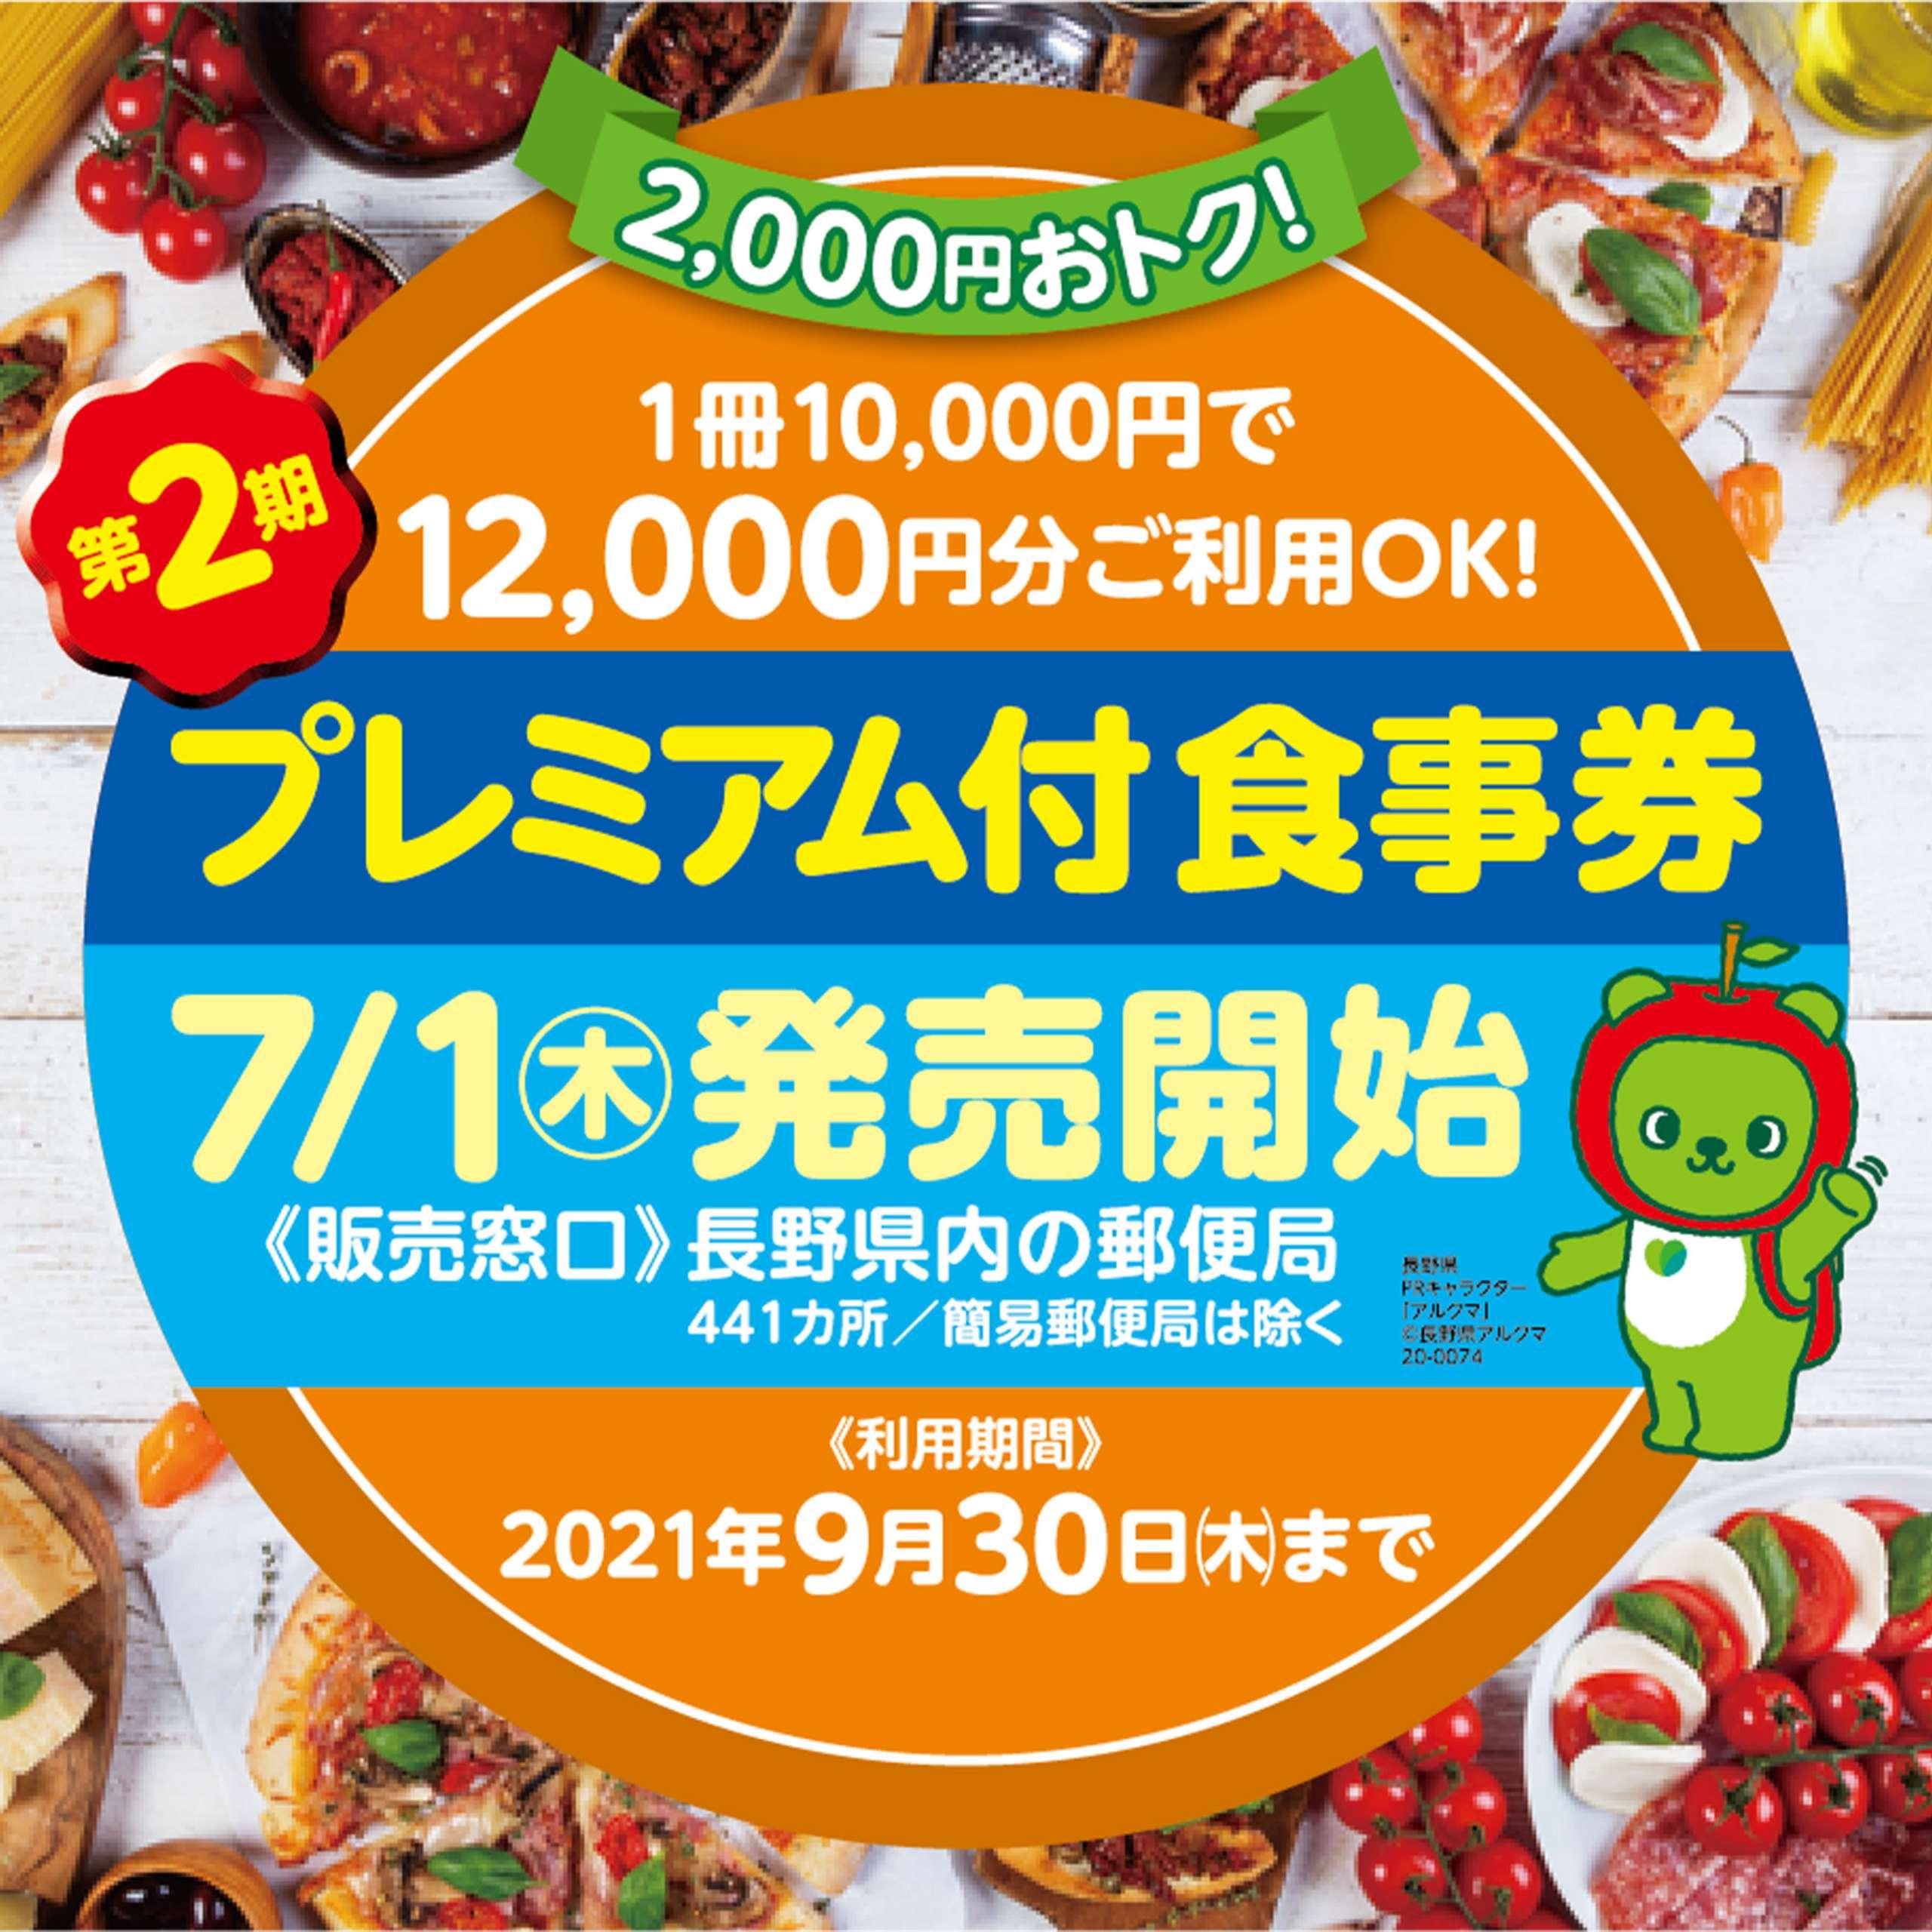 Go To Eatプレミアム付食事券